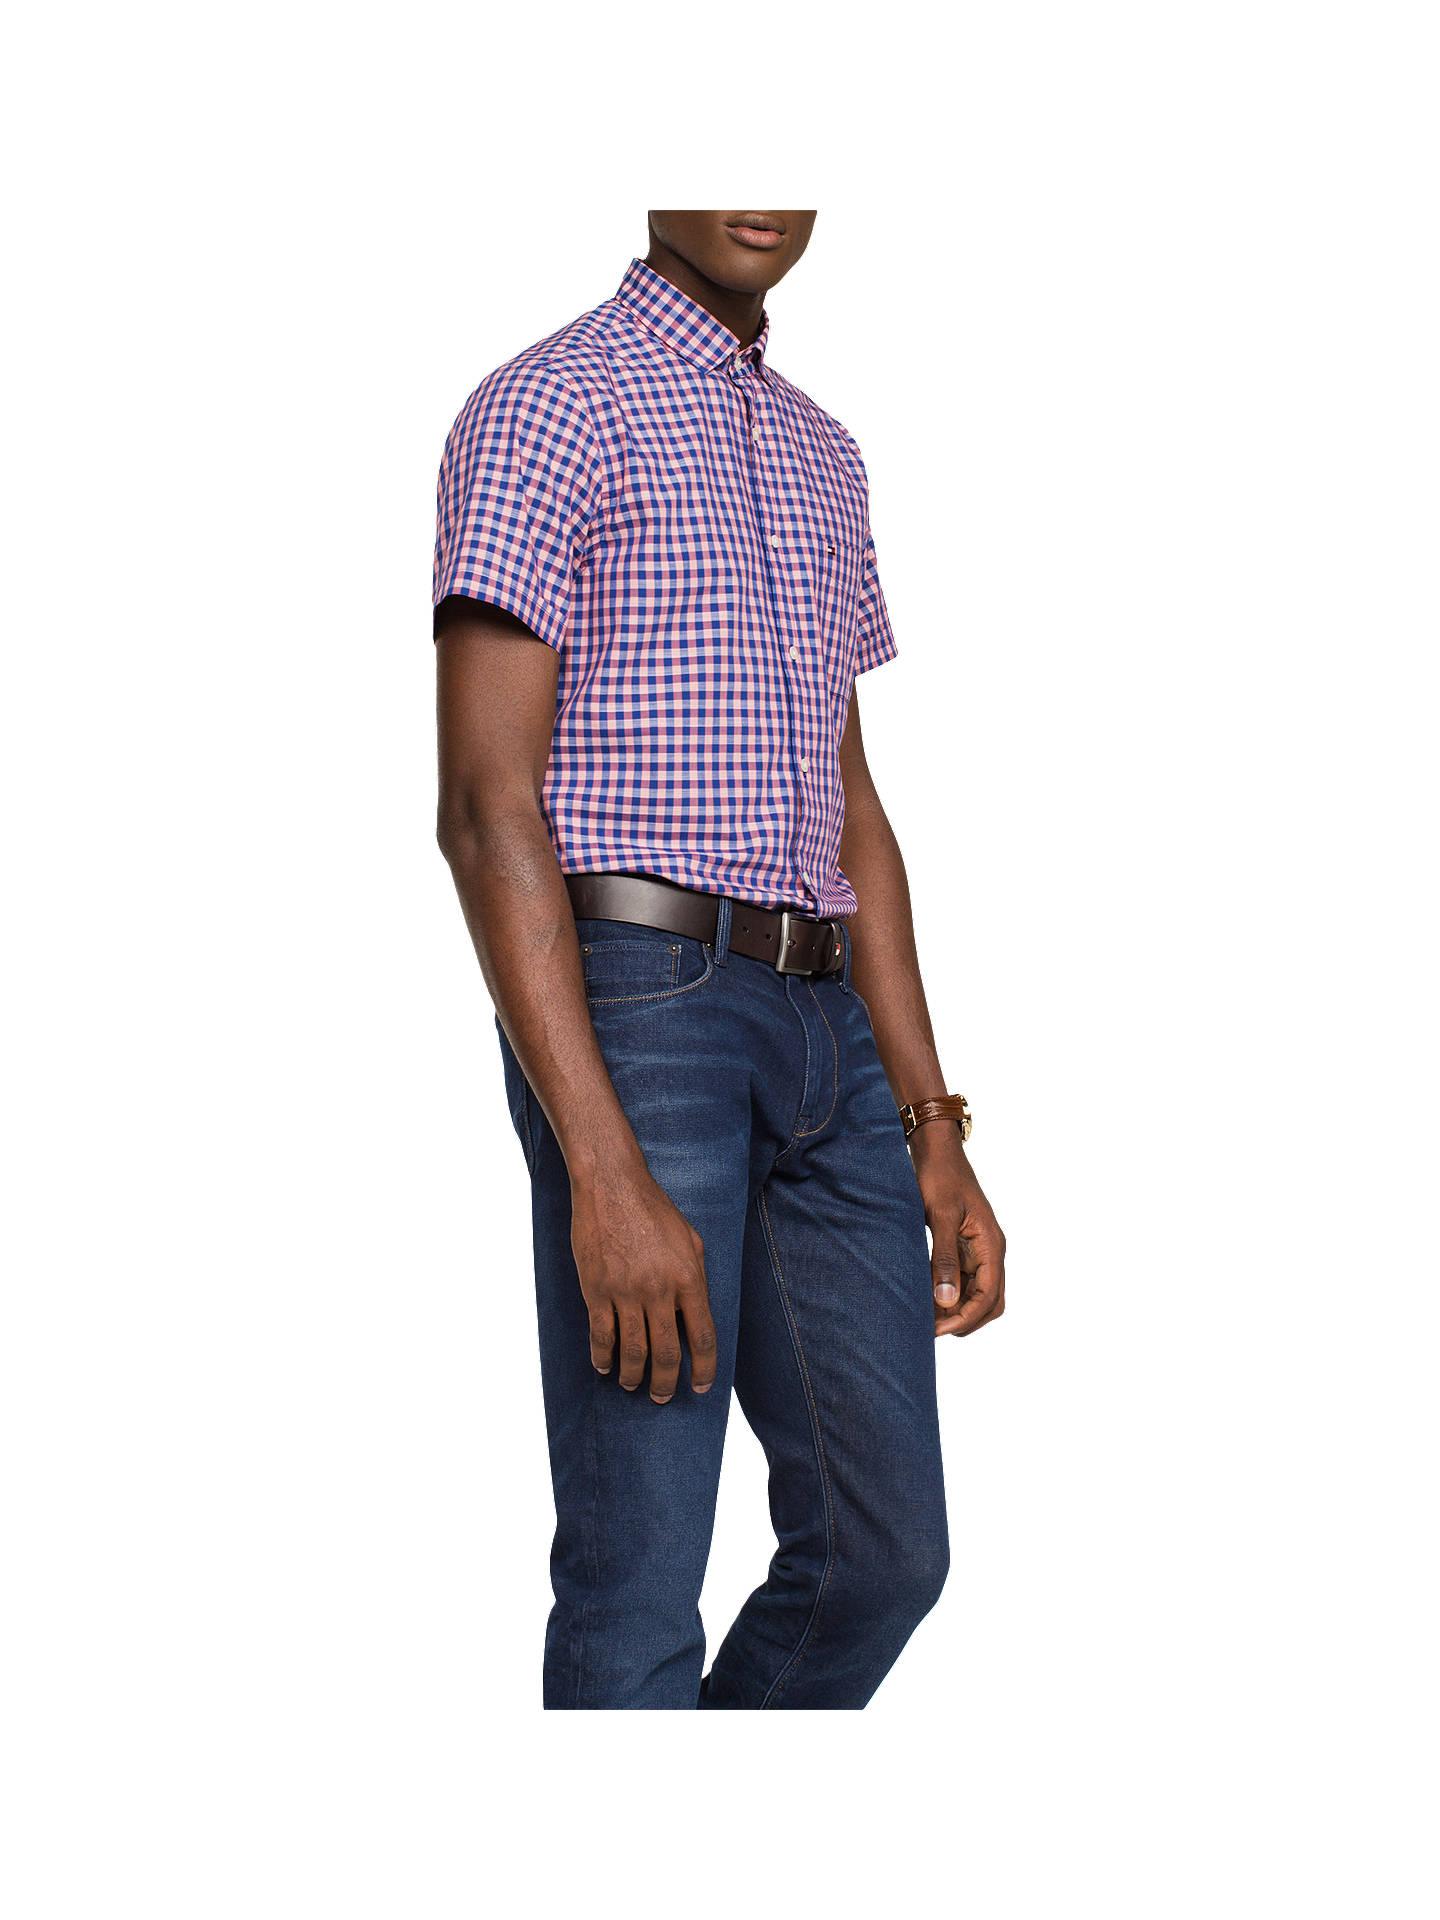 8490aaa5d Buy Tommy Hilfiger Short Sleeve Slim Fit Gingham Shirt, Rose Of Sharon/  Sodalite Blue ...